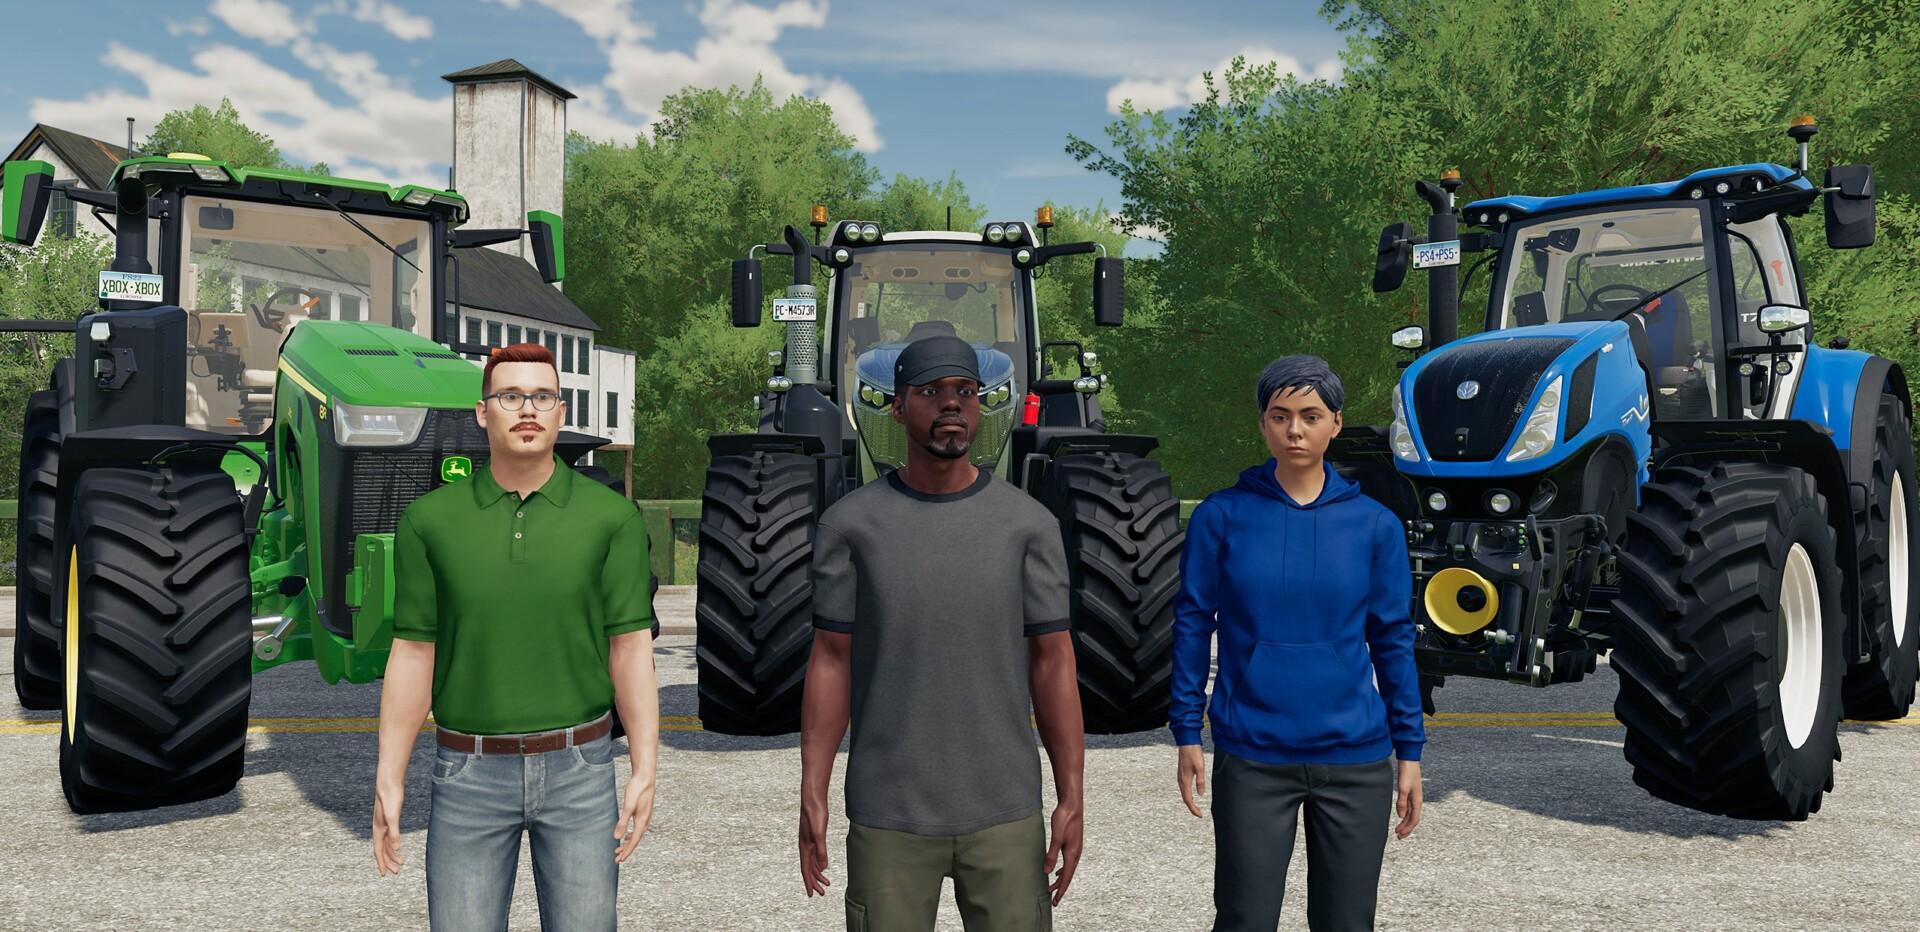 farming-simulator-22-will-get-cross-play-support